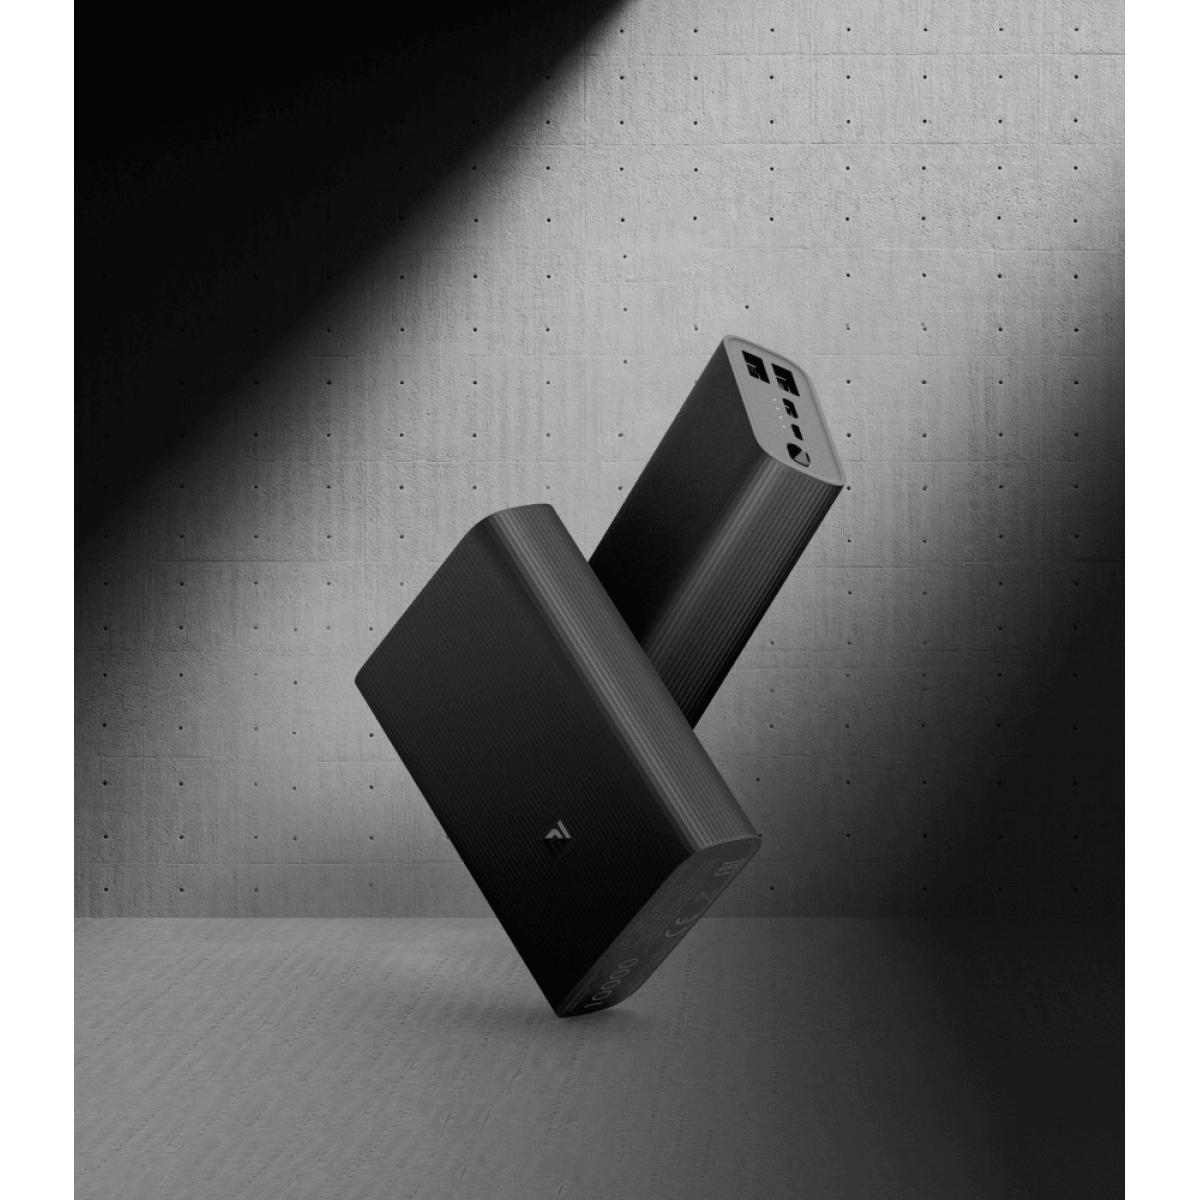 Аккумулятор внешний Xiaomi 10000mAh Mi Power Bank 3 Ultra compact